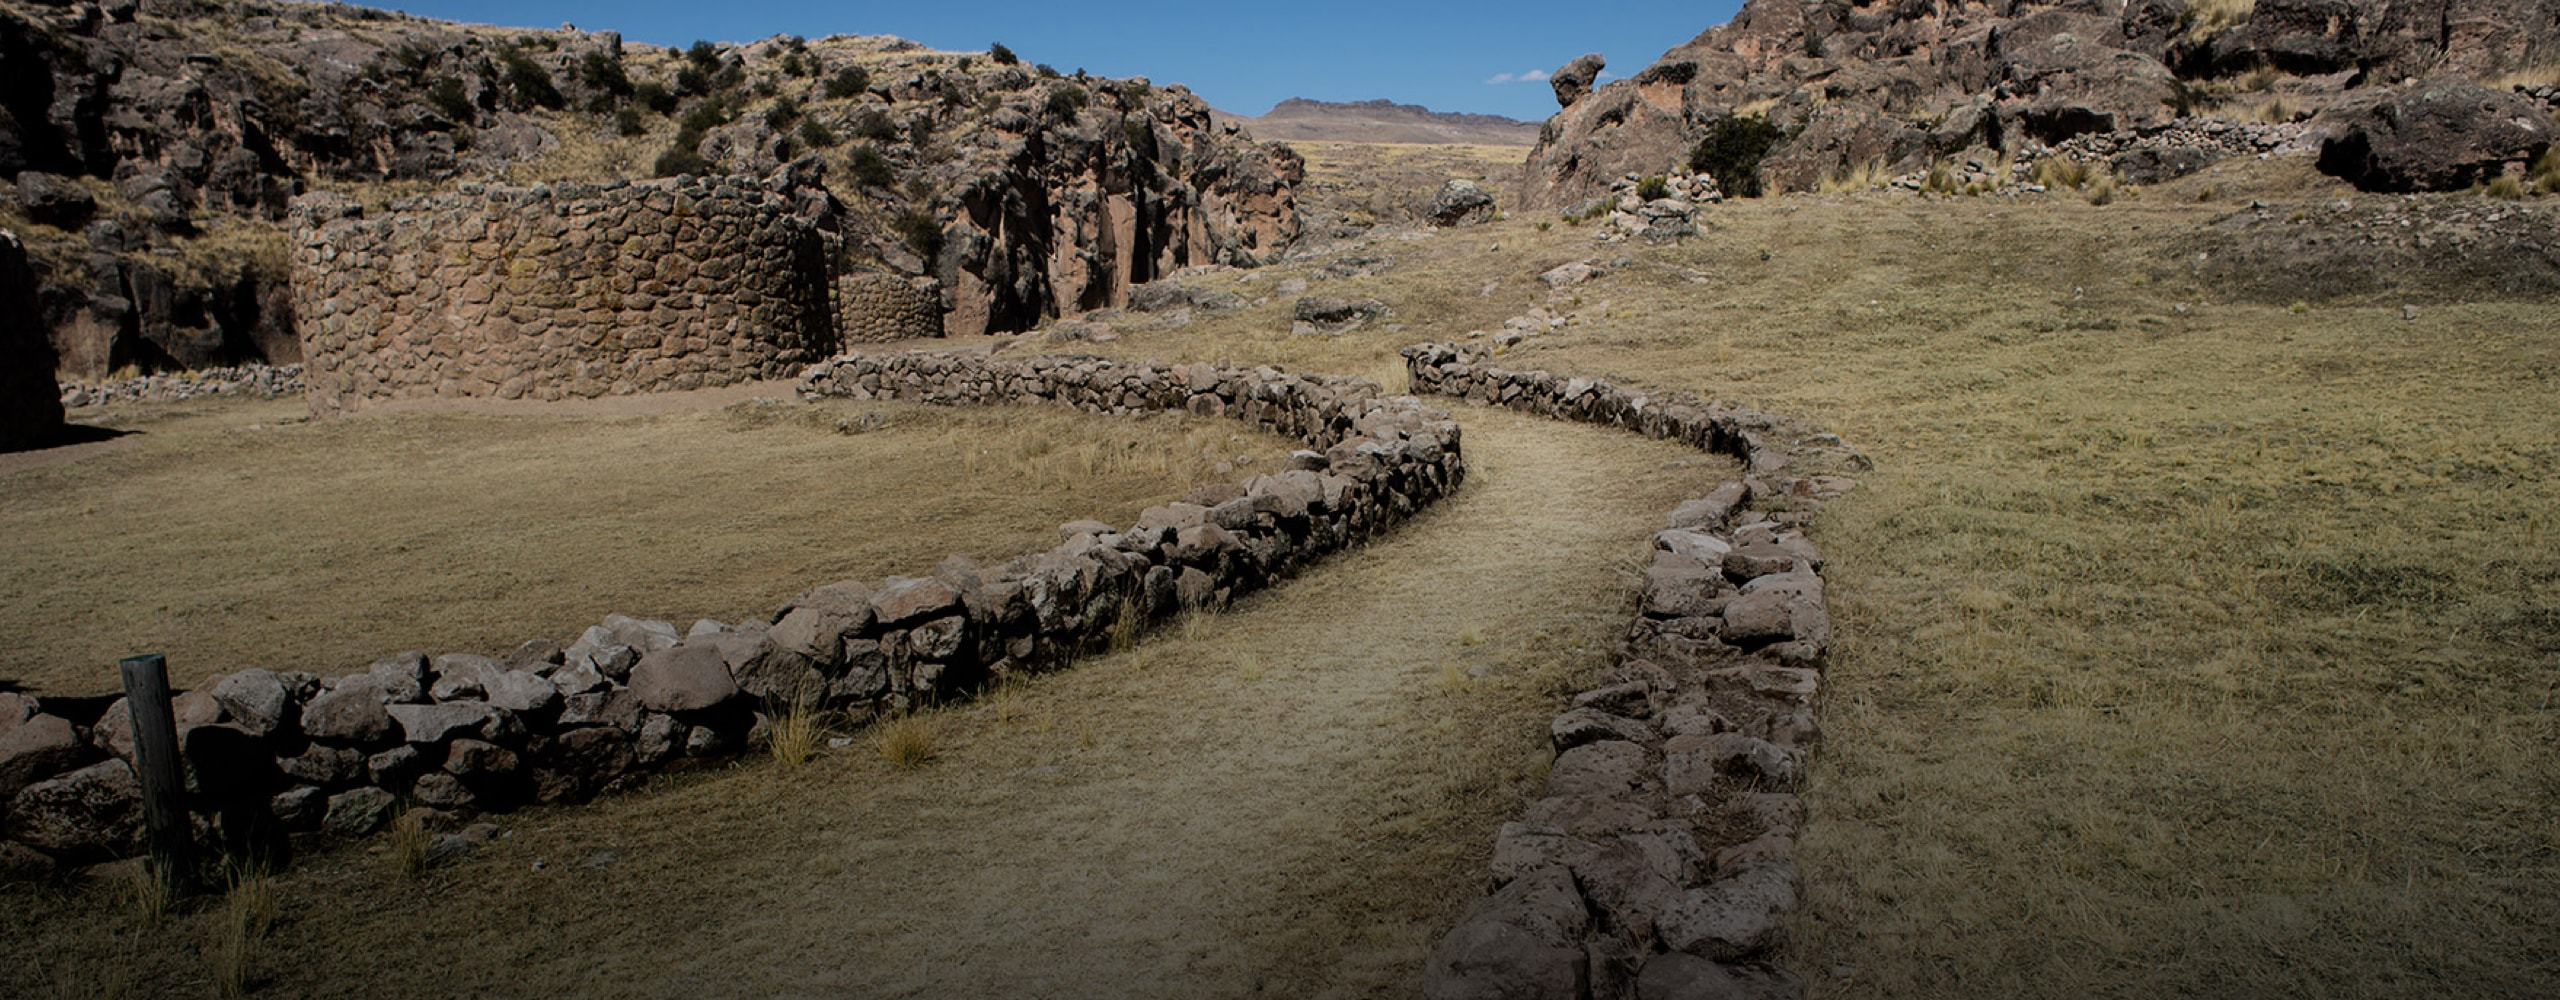 Inka Road Engineering An Empire